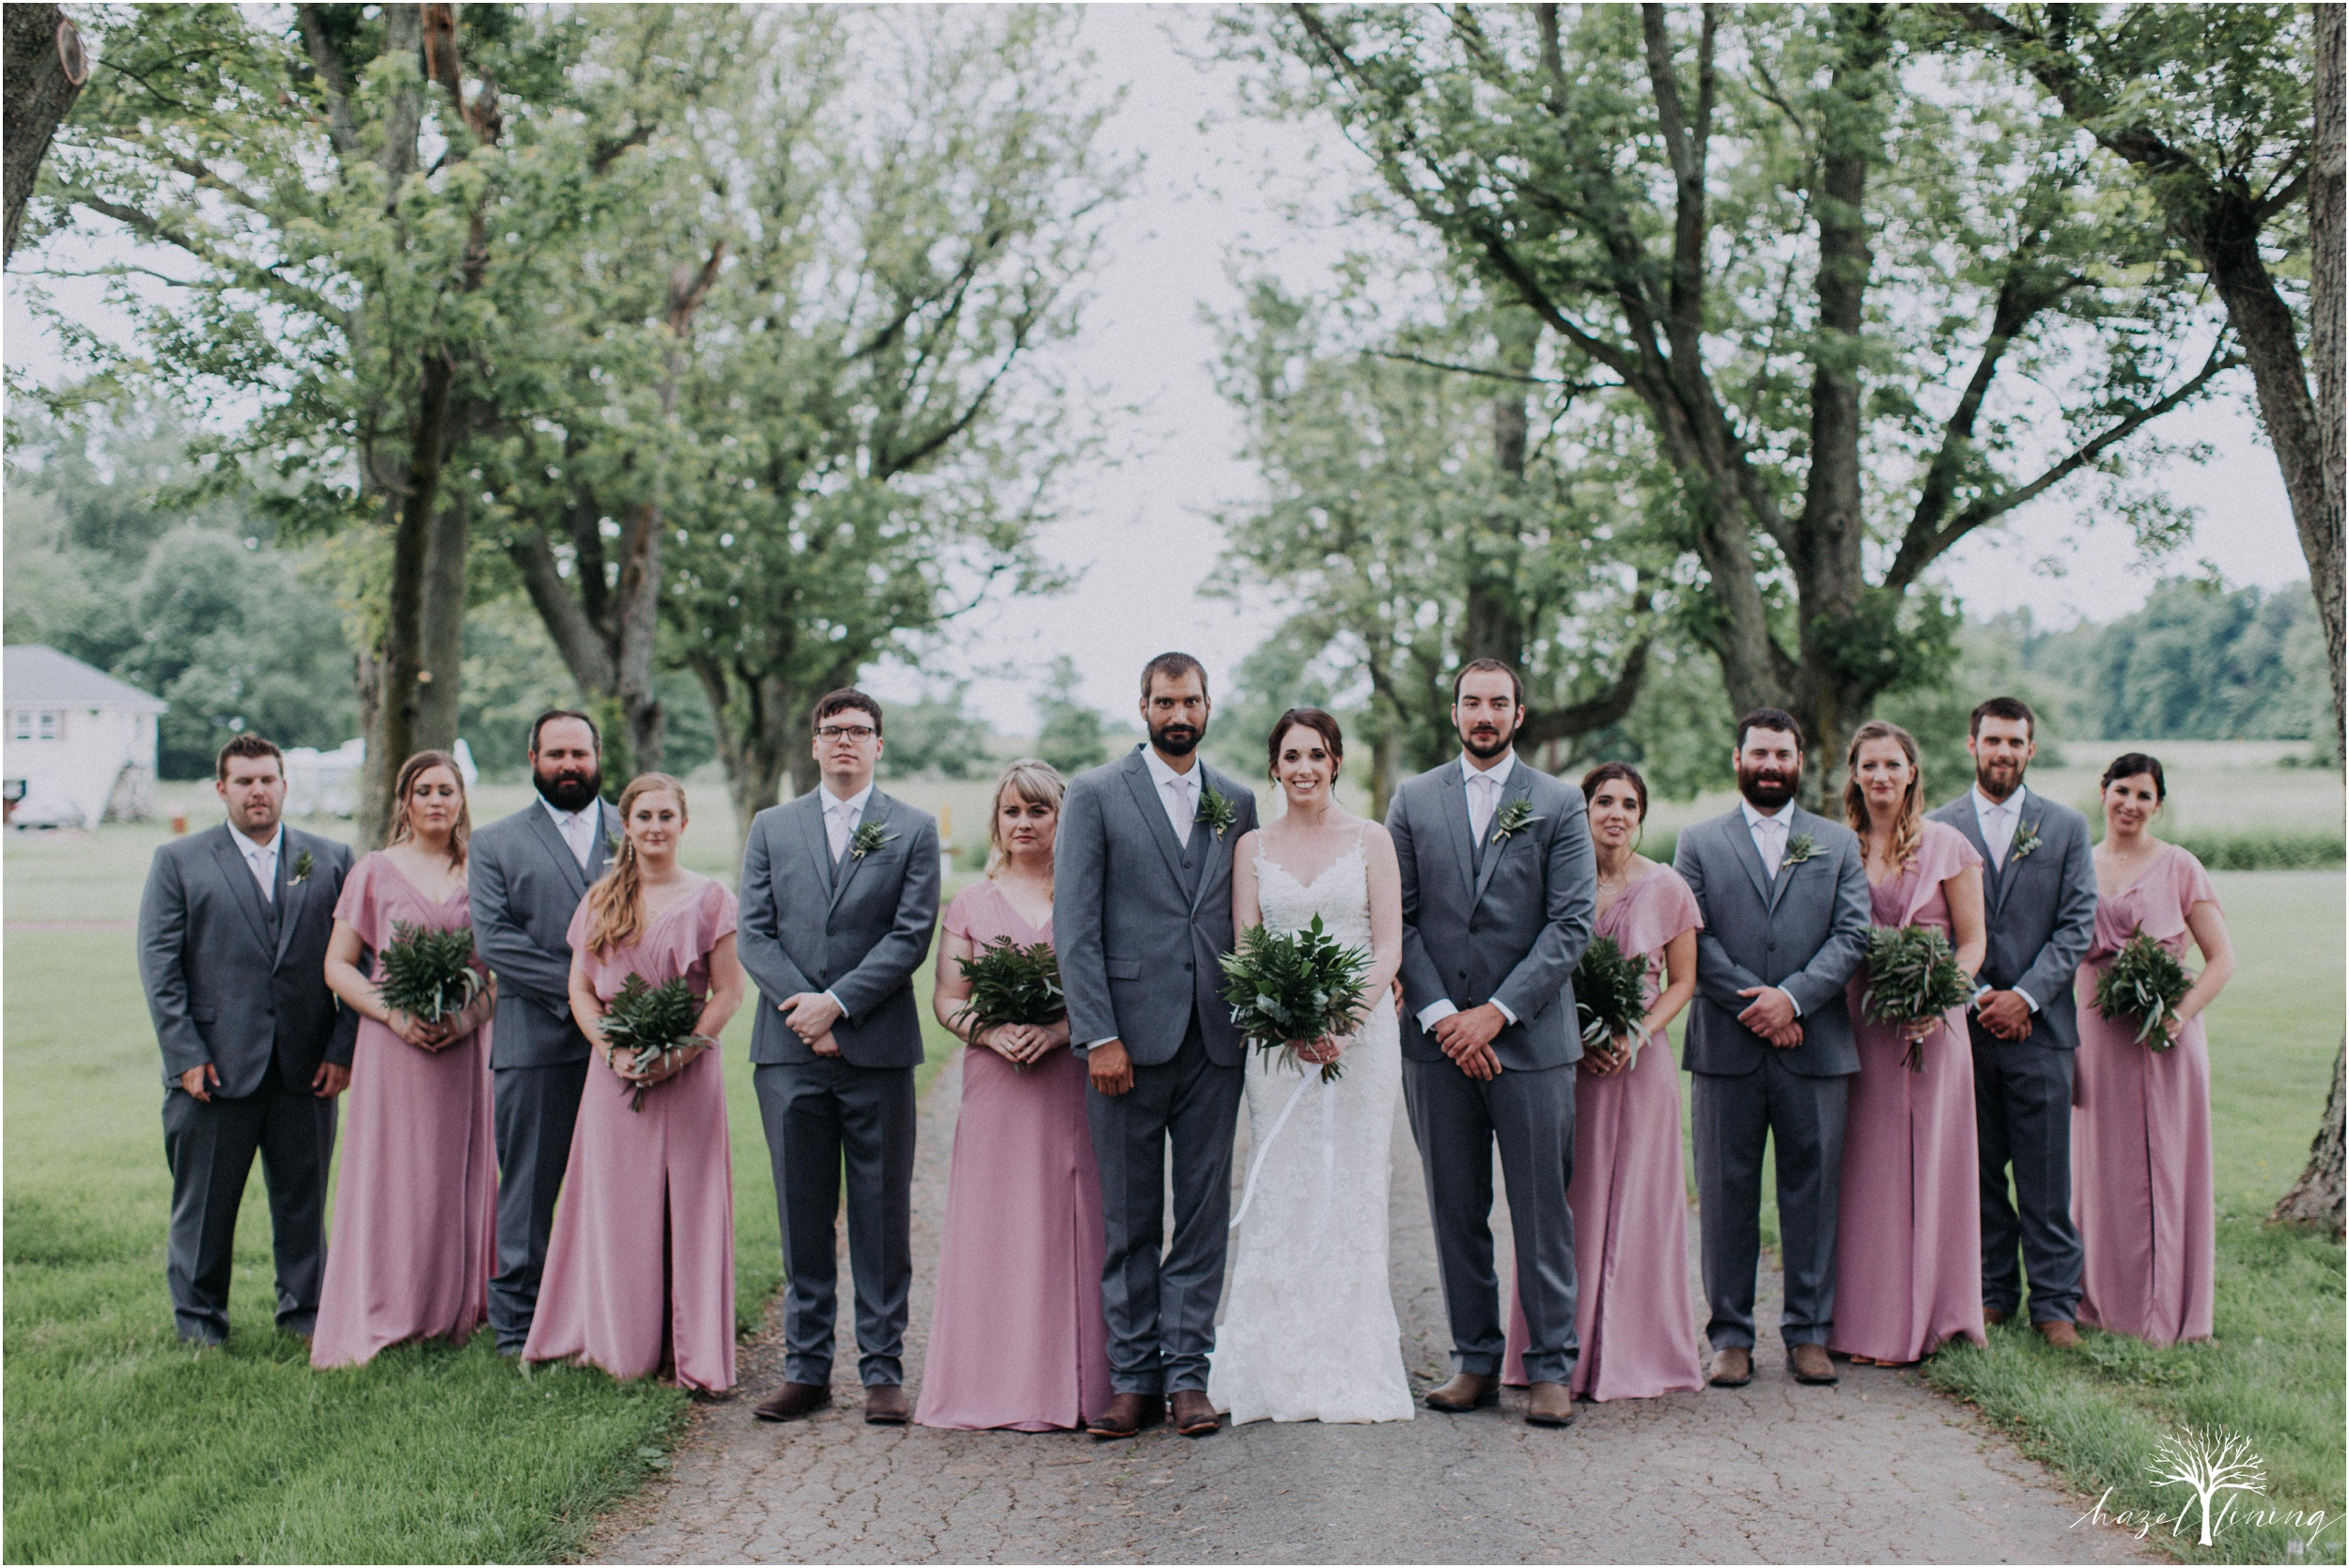 hazel-lining-travel-wedding-elopement-photography-lisa-landon-shoemaker-the-farm-bakery-and-events-bucks-county-quakertown-pennsylvania-summer-country-outdoor-farm-wedding_0078.jpg